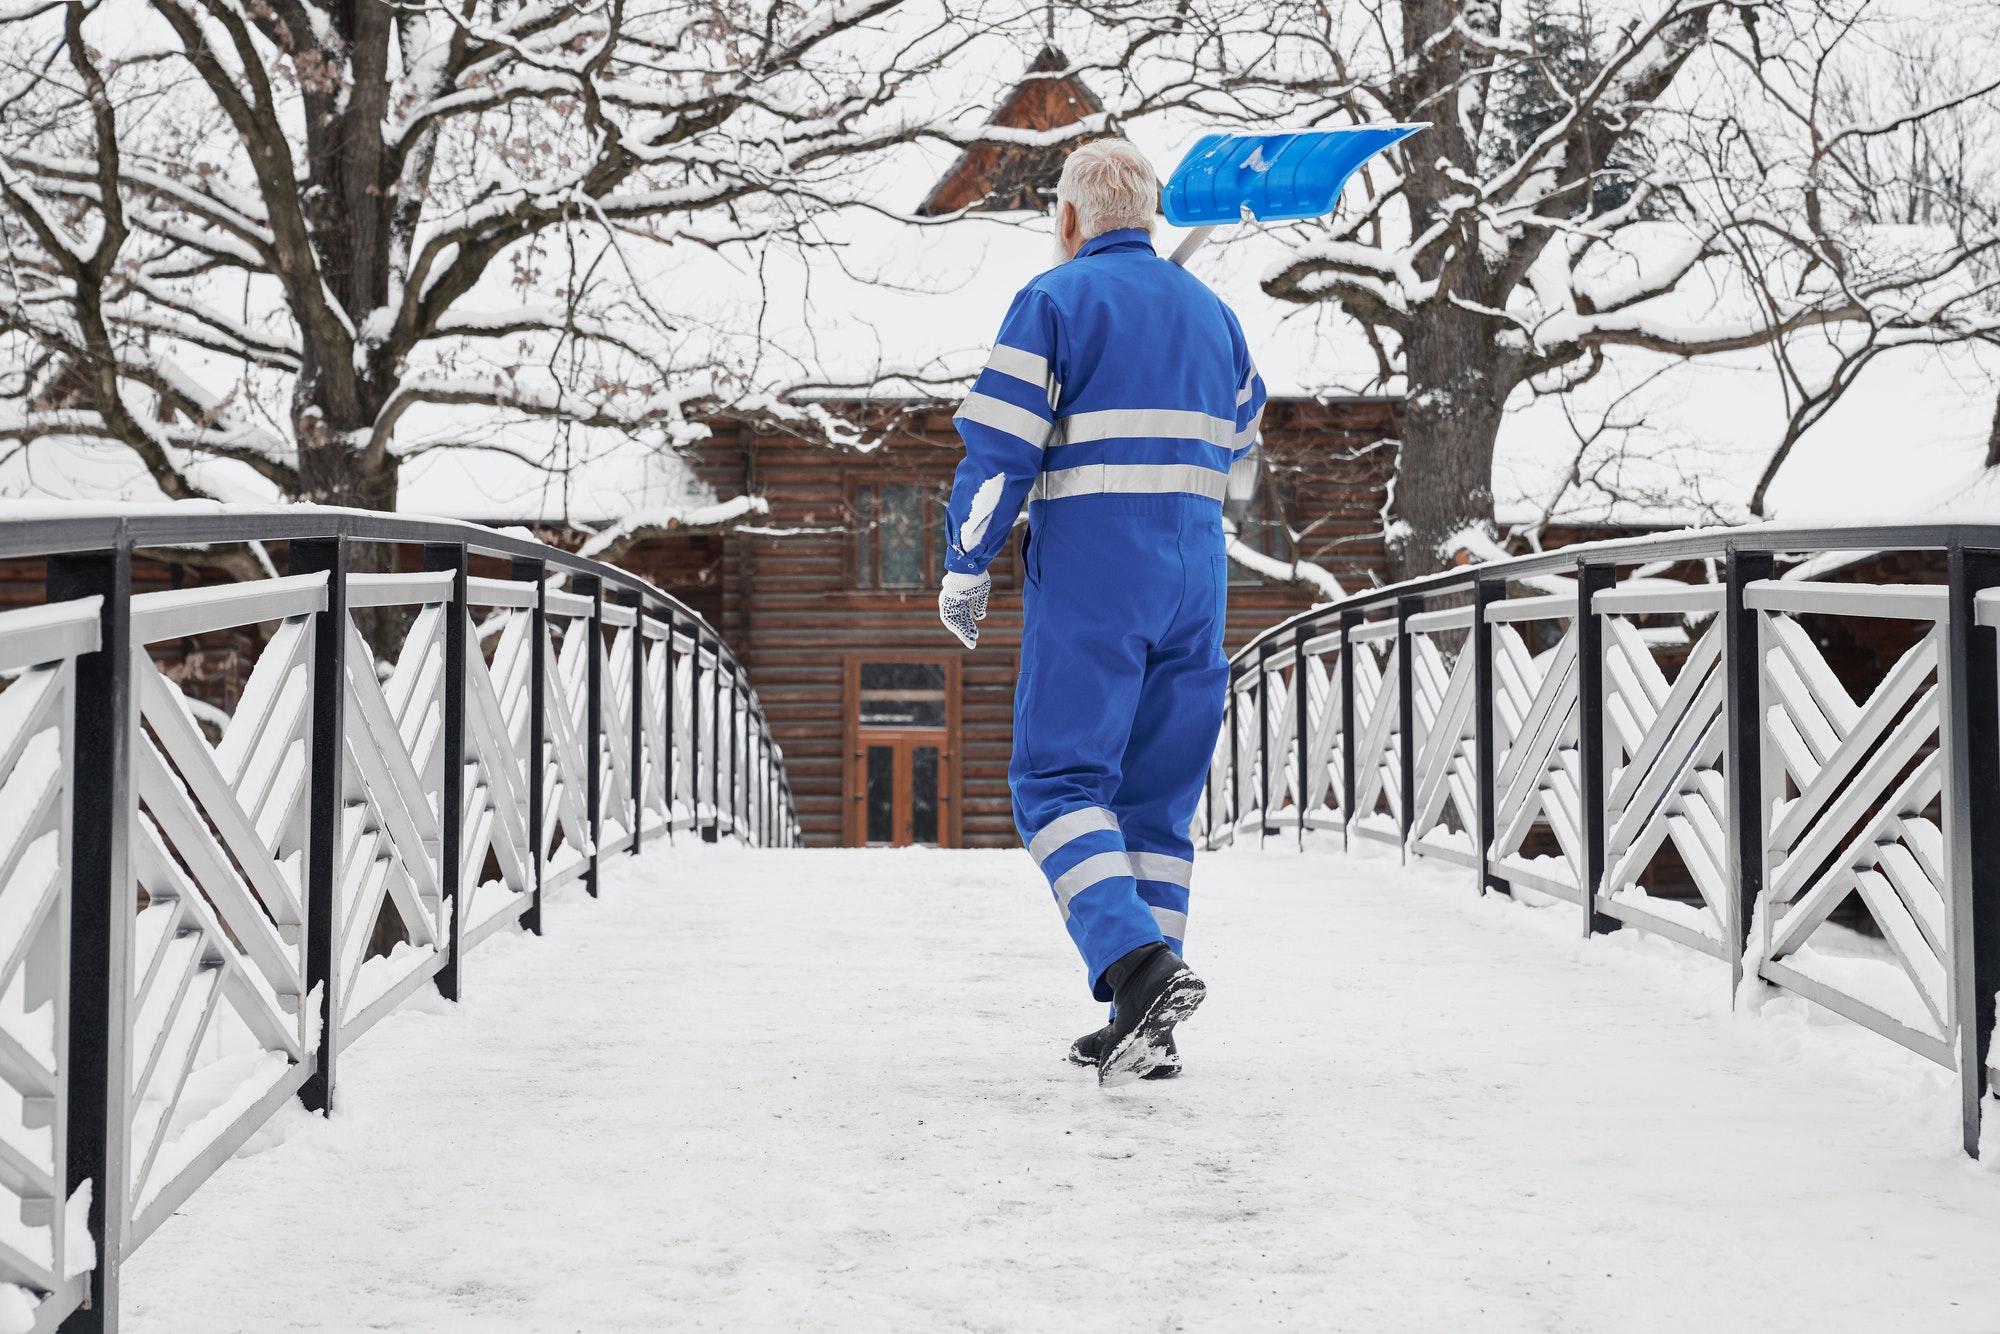 Man with snow shovel on shoulder back view